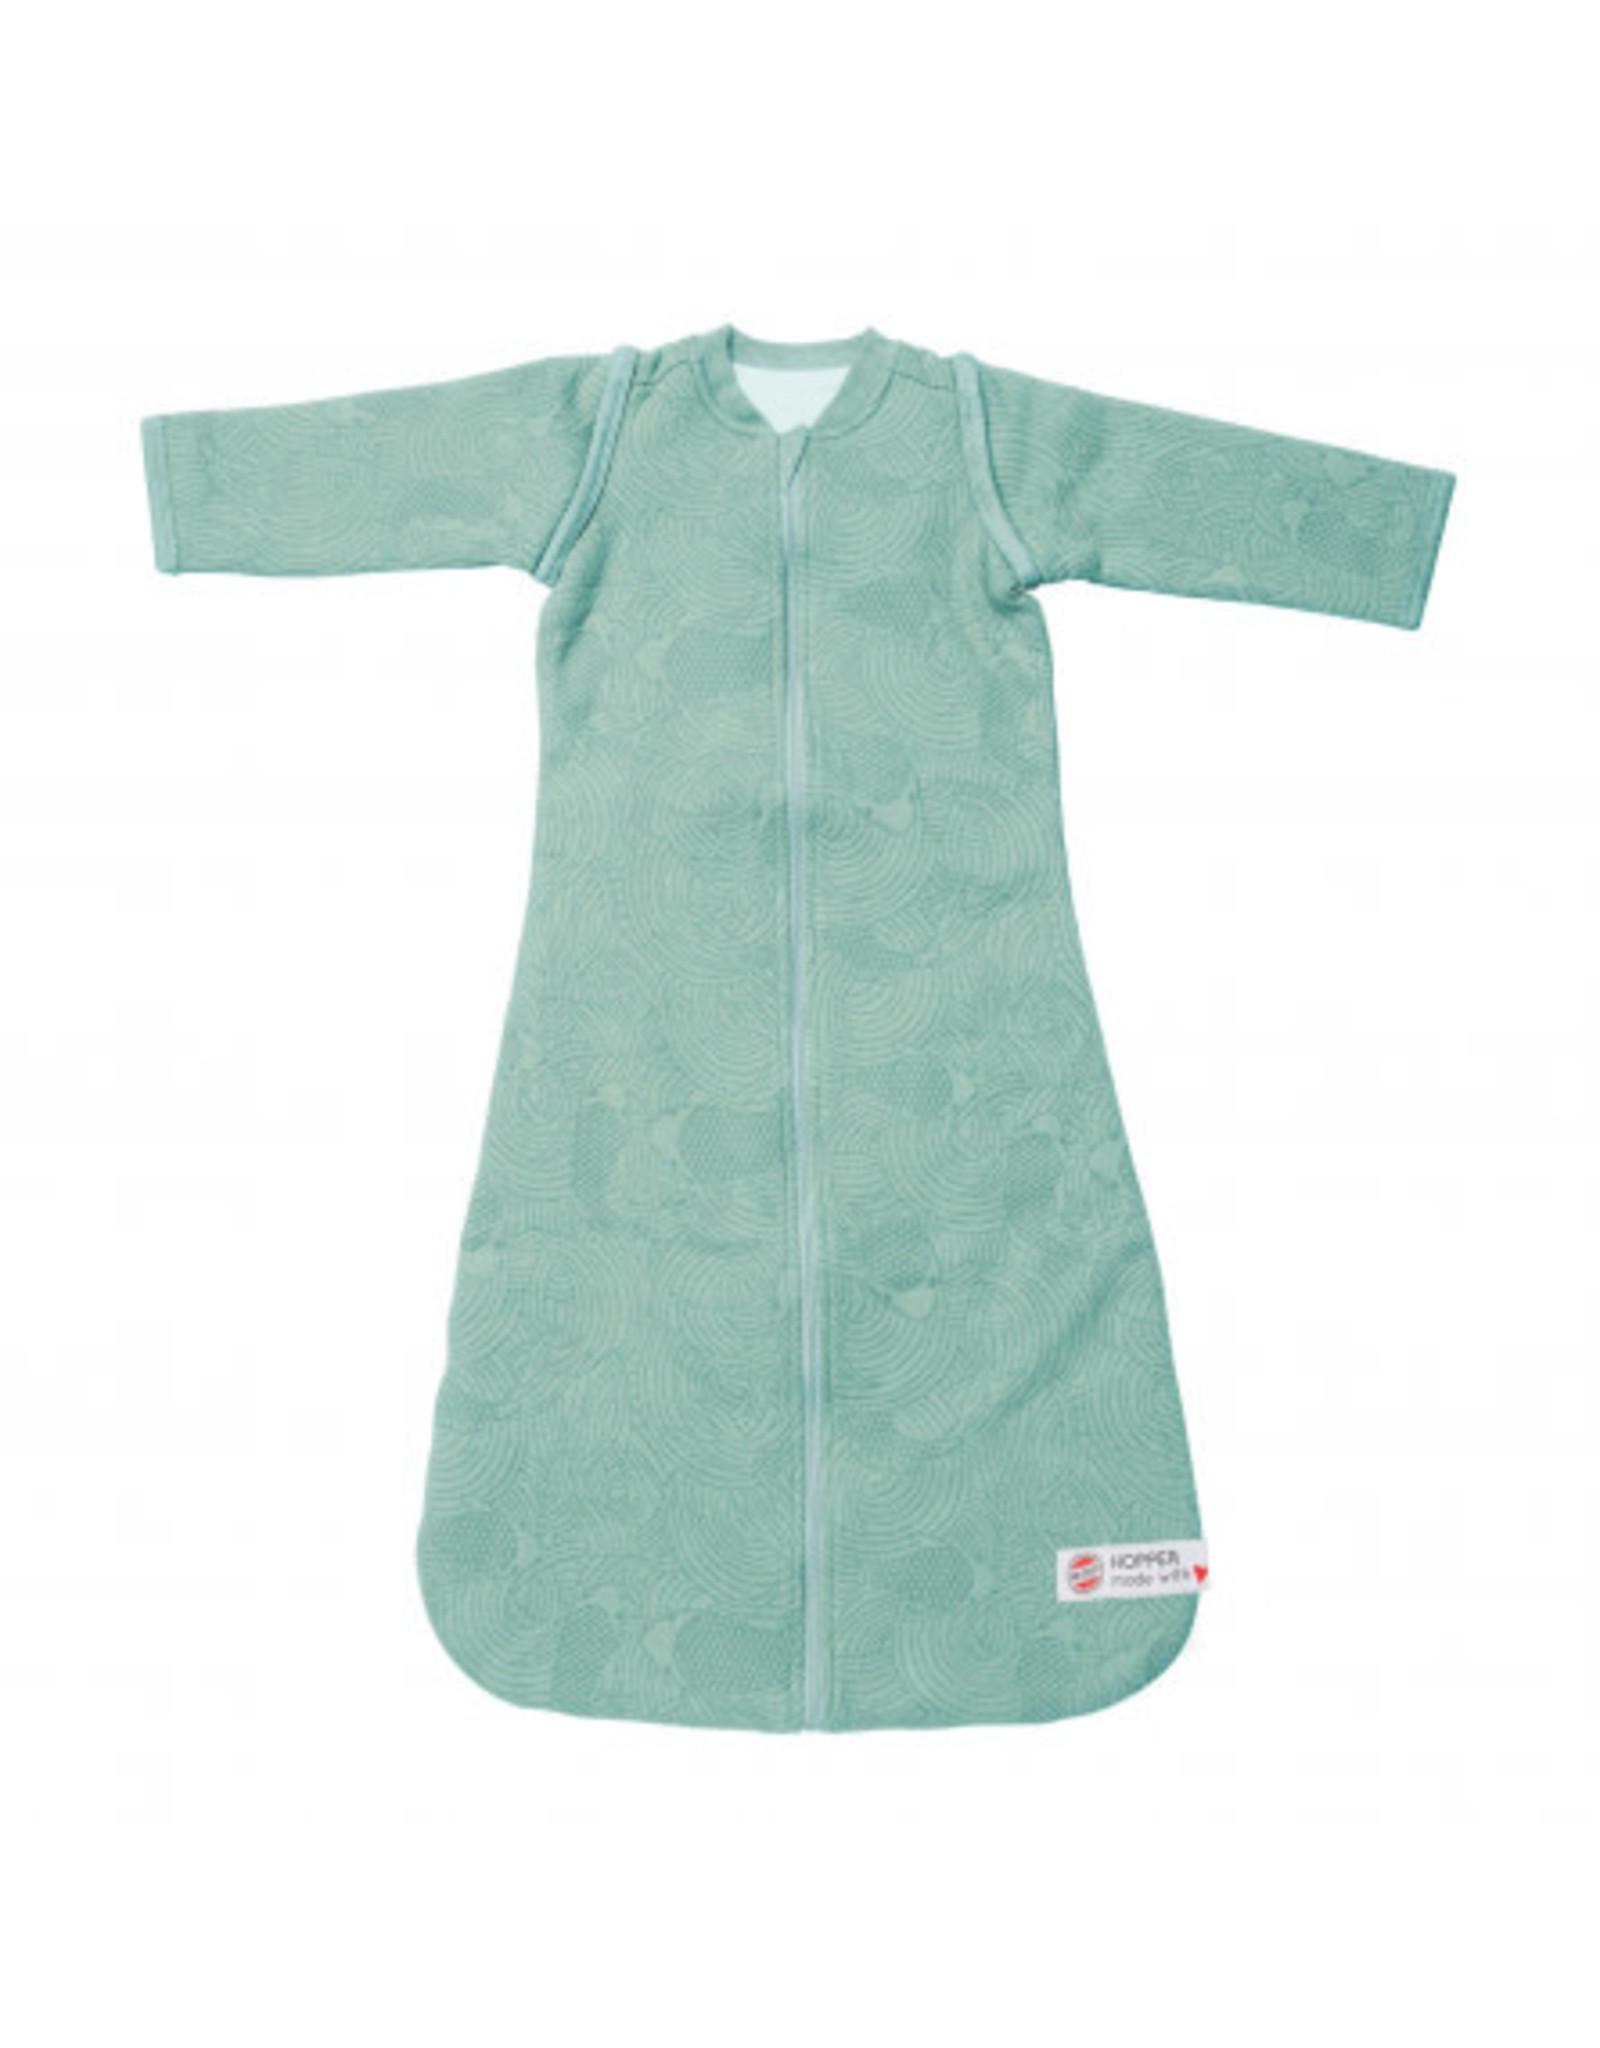 Lodger Lodger Winterslaapzak Baby Hopper Sleeves Empire 68/80 Silt Green